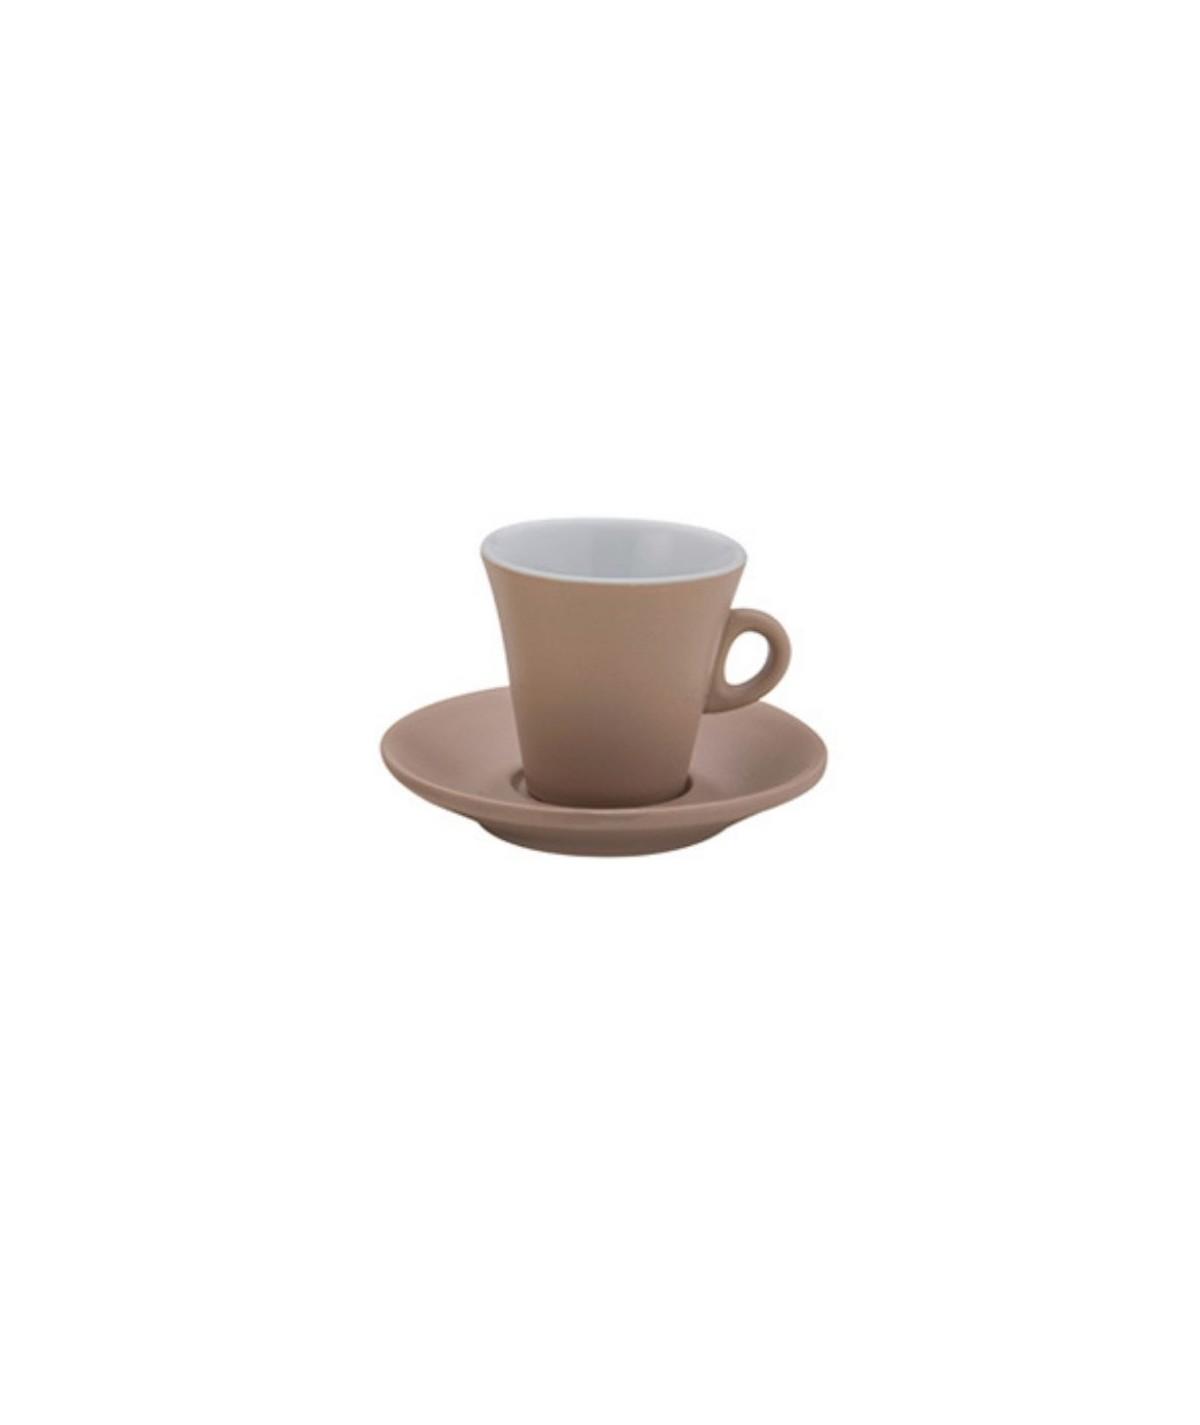 Morini tazzina da caffè...